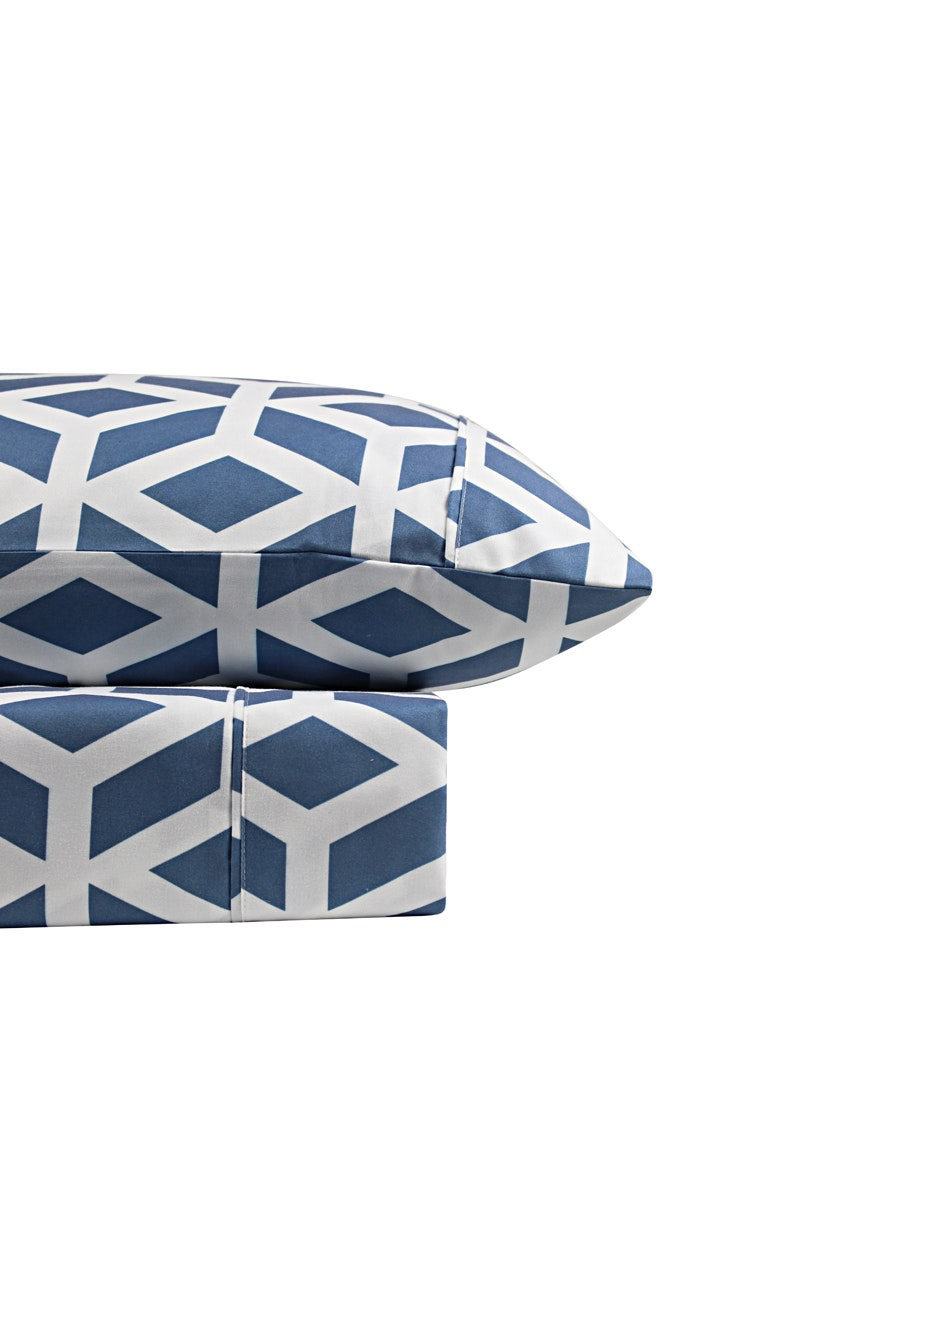 Thermal Flannel Sheet Sets - Manhattan Design - Bay Blue - Queen Bed